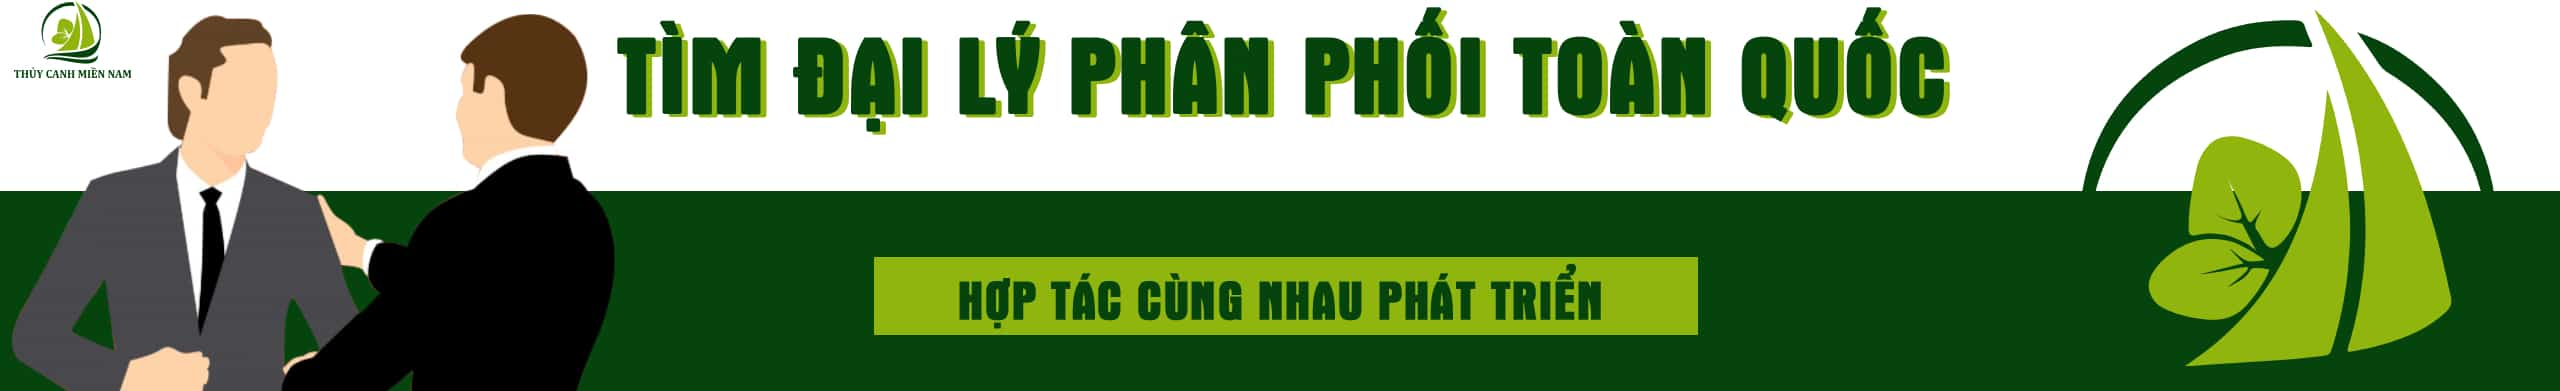 tuyen-dai-ly-phan-phoi-vat-tu-thuy-canh-toan-quoc